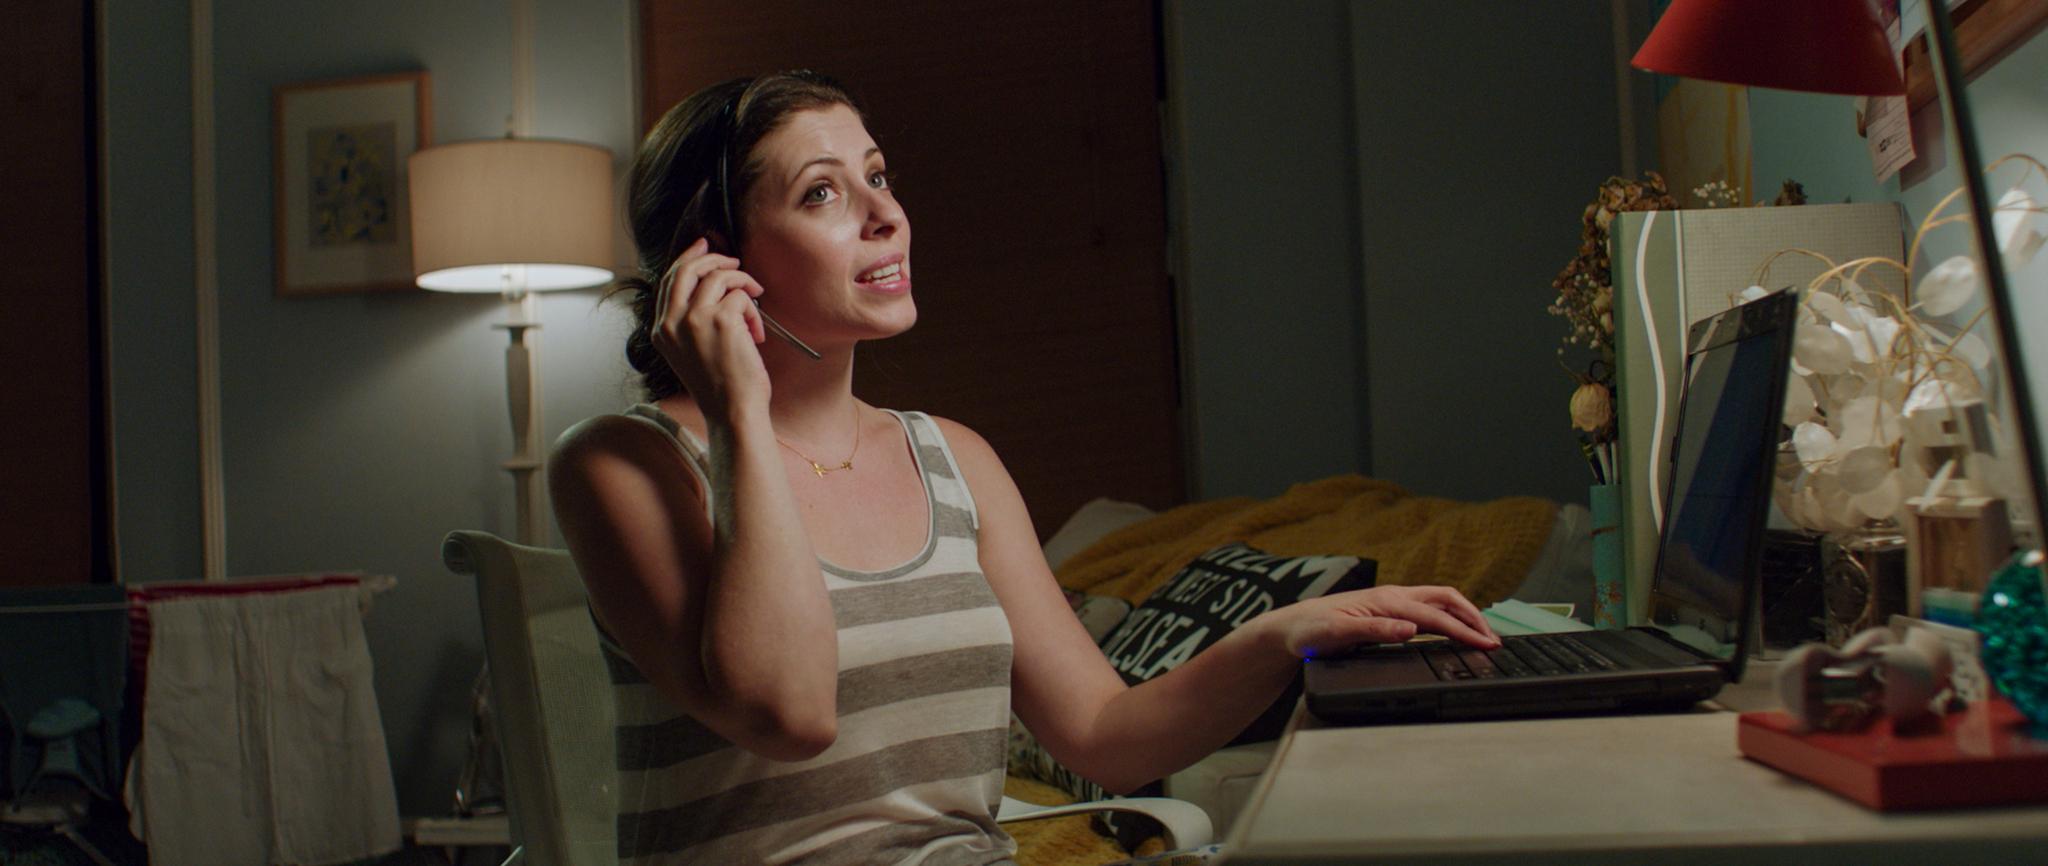 Lauren Miller Rogen in For a Good Time, Call... (2012)